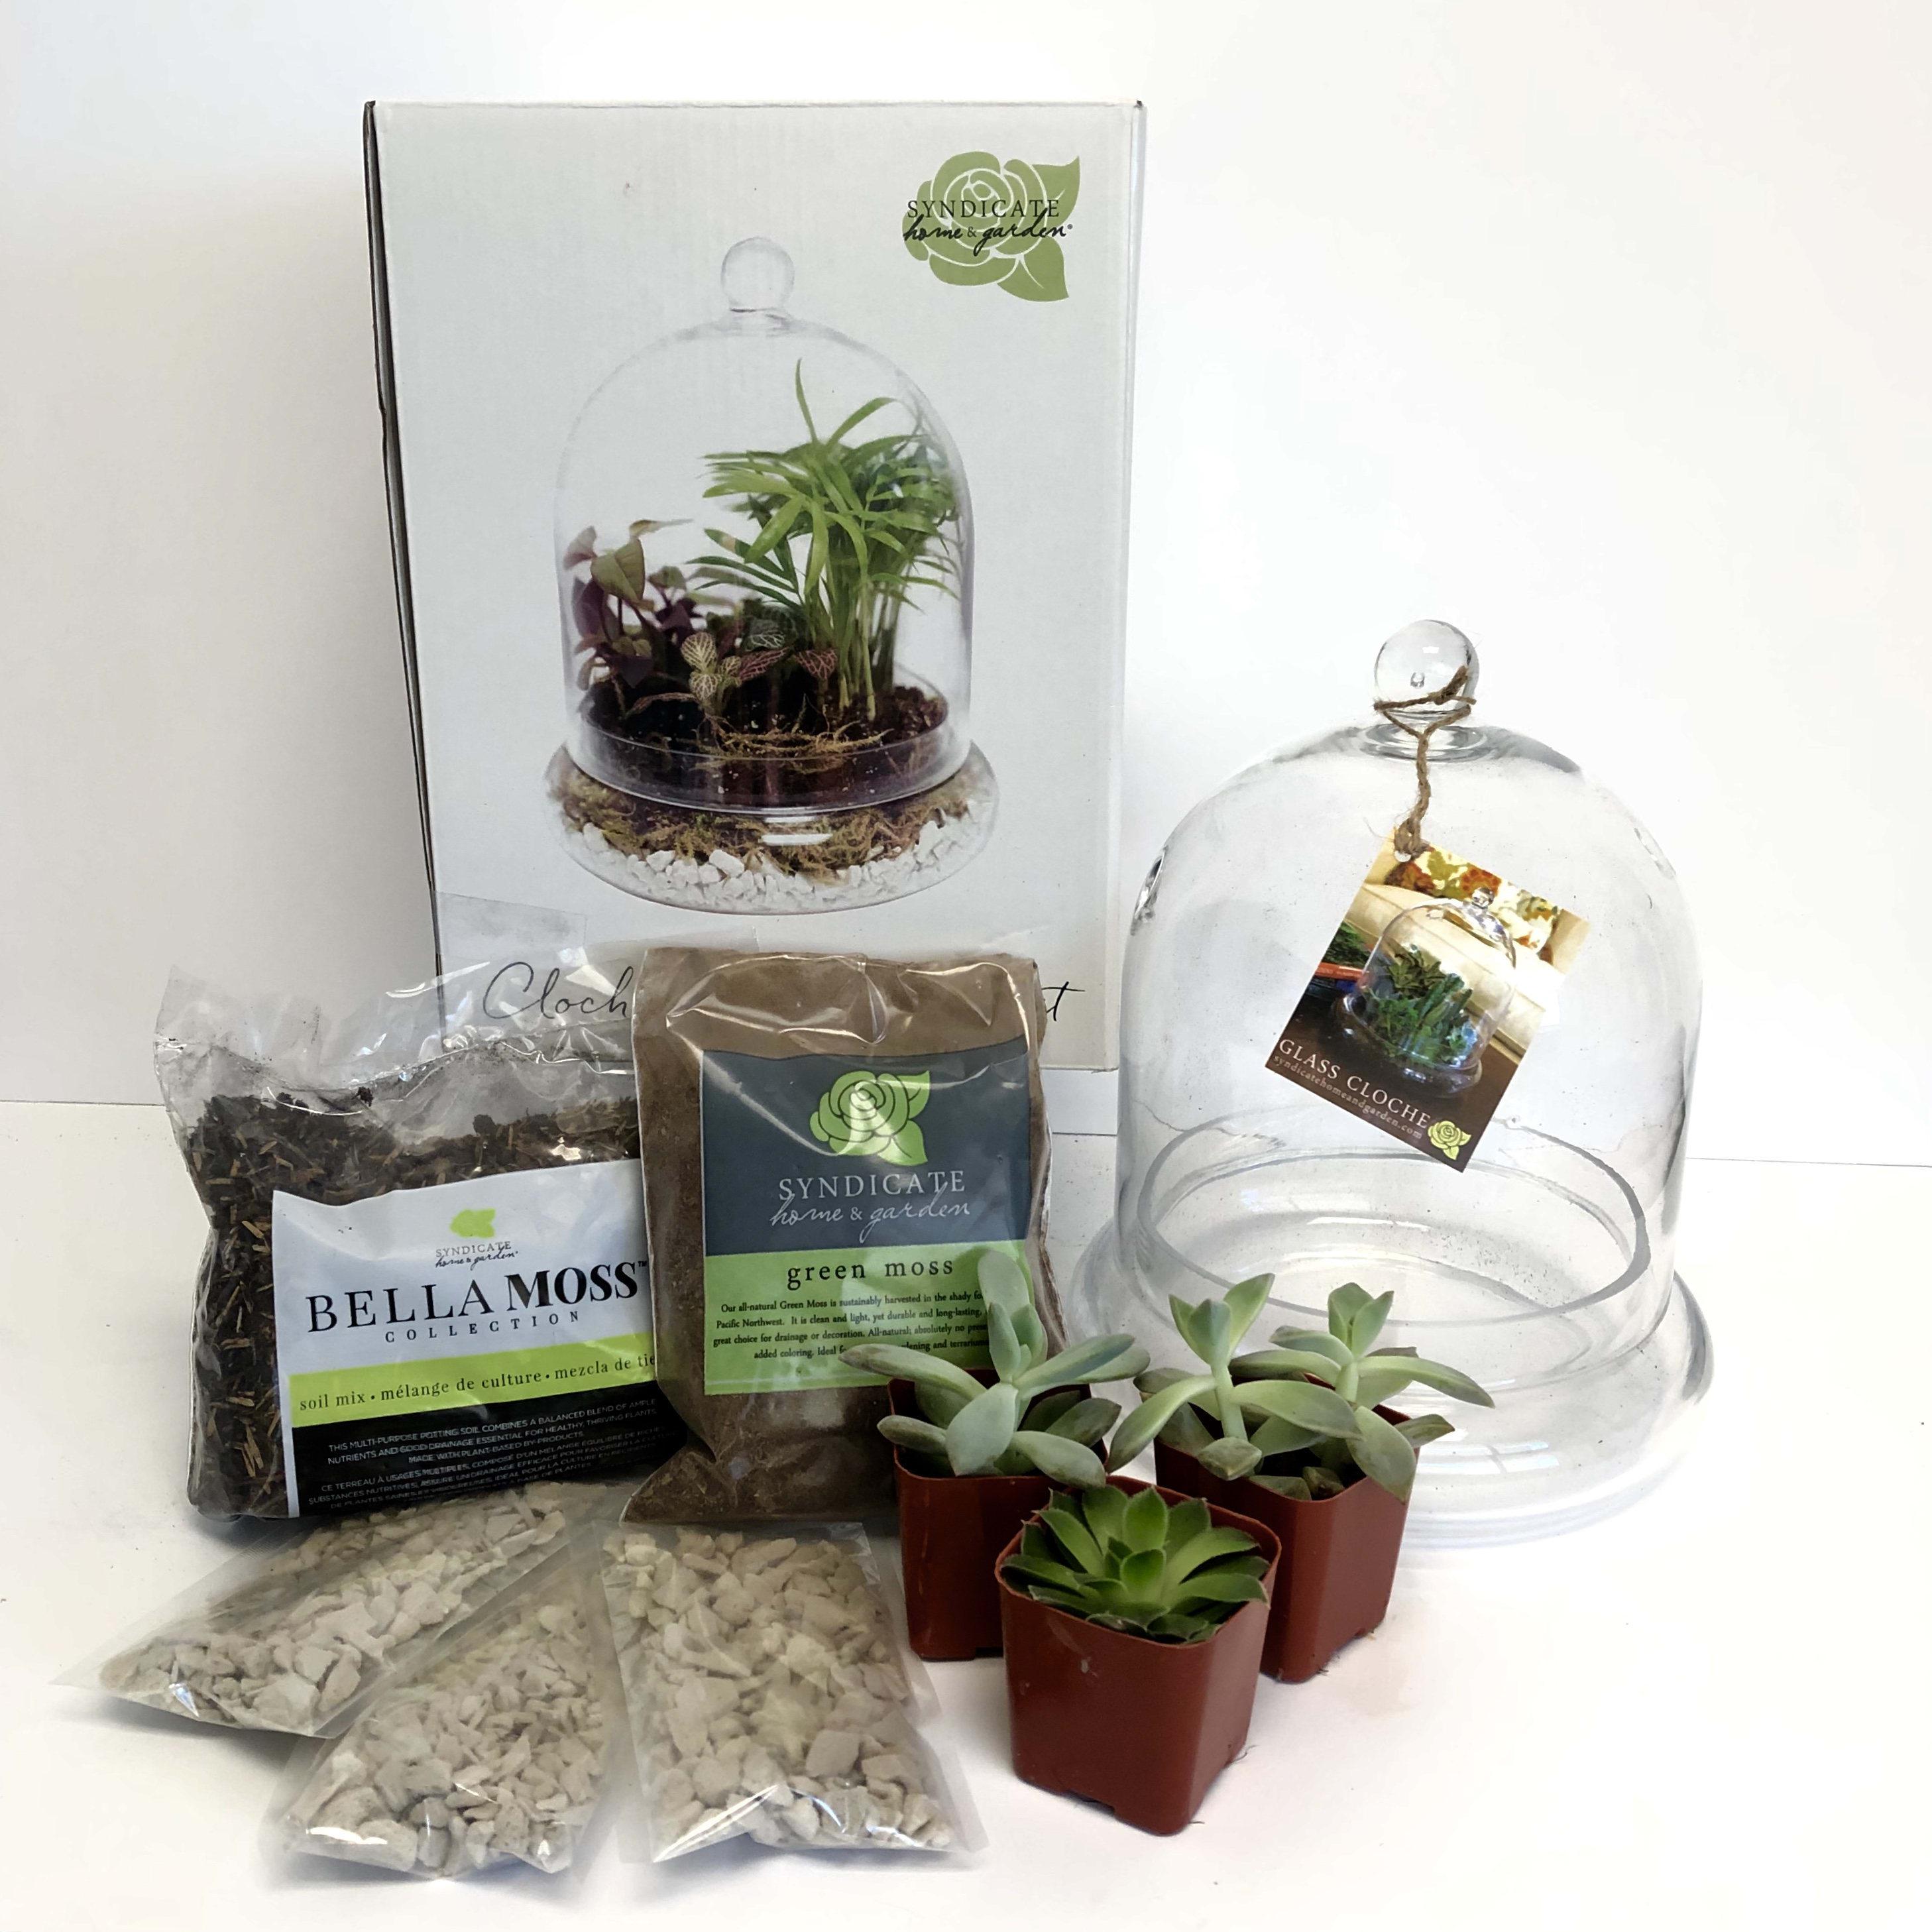 Diy Terrarium Kit In Phoenix Az Pjs Flowers Events